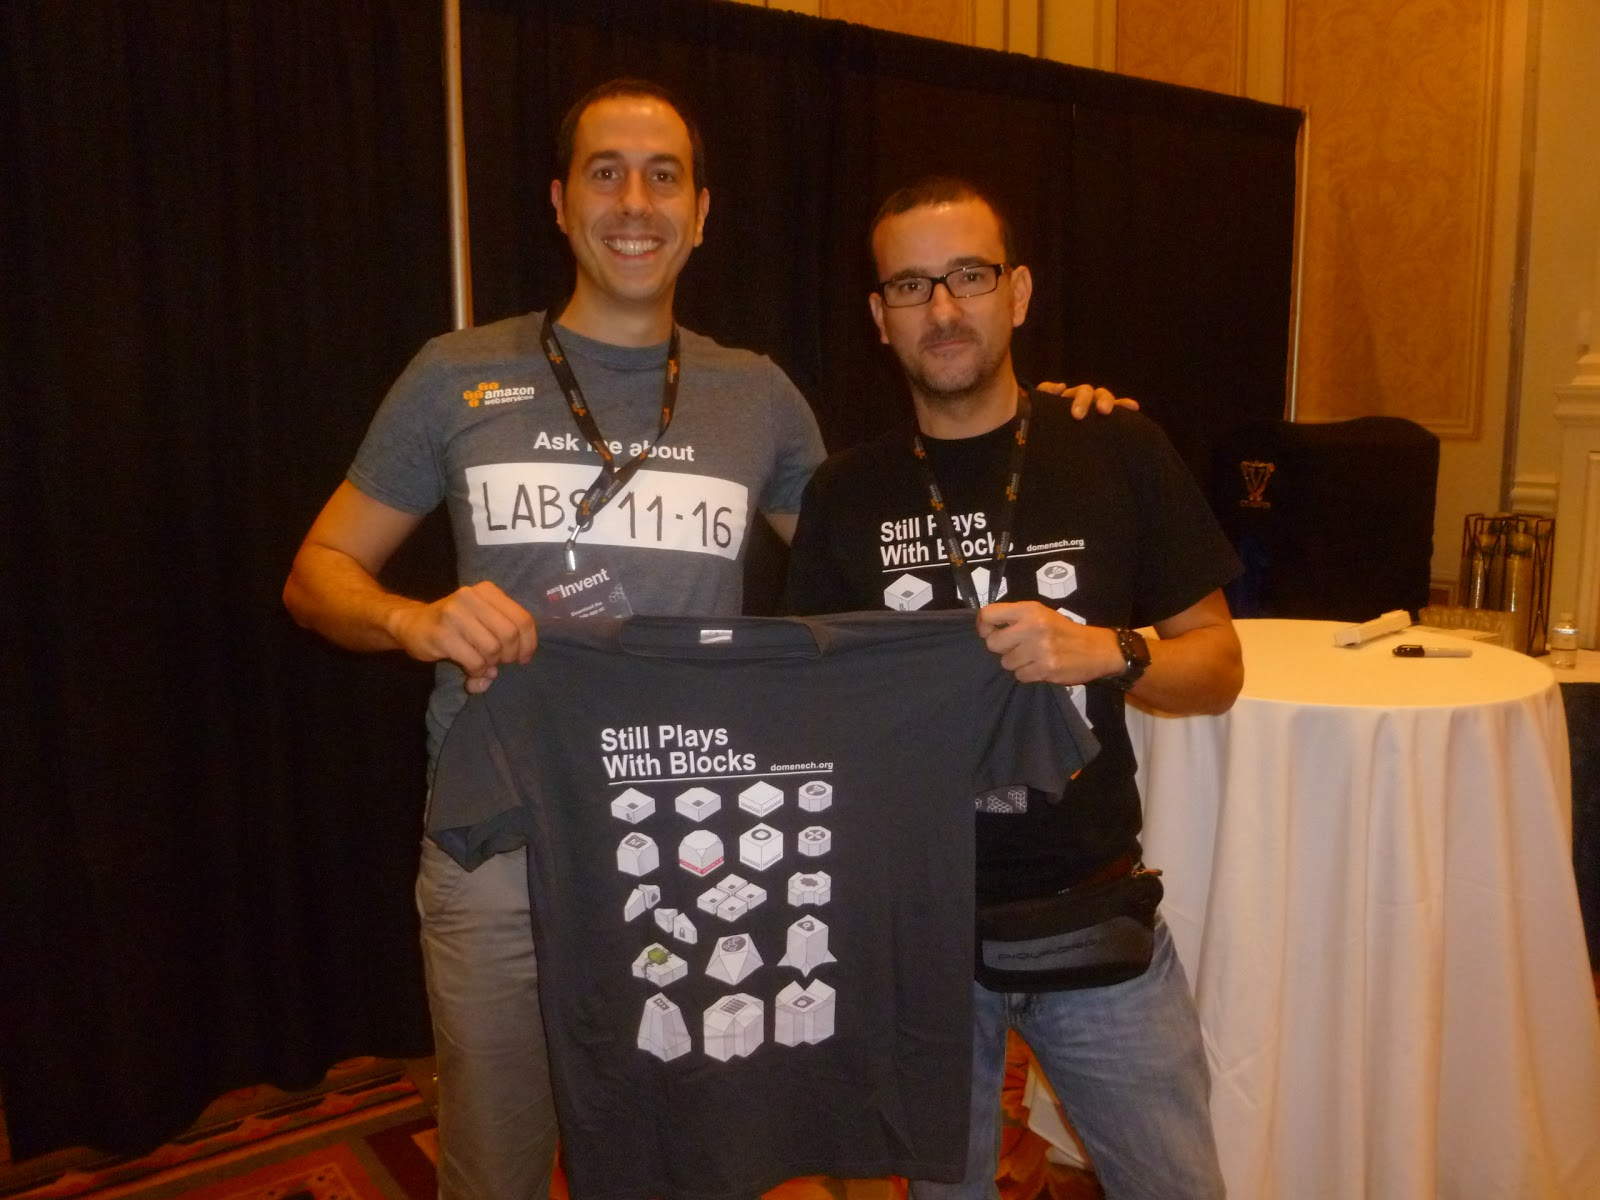 aws-reinvent-t-shirt-blog-domenech-org-carlos-conde